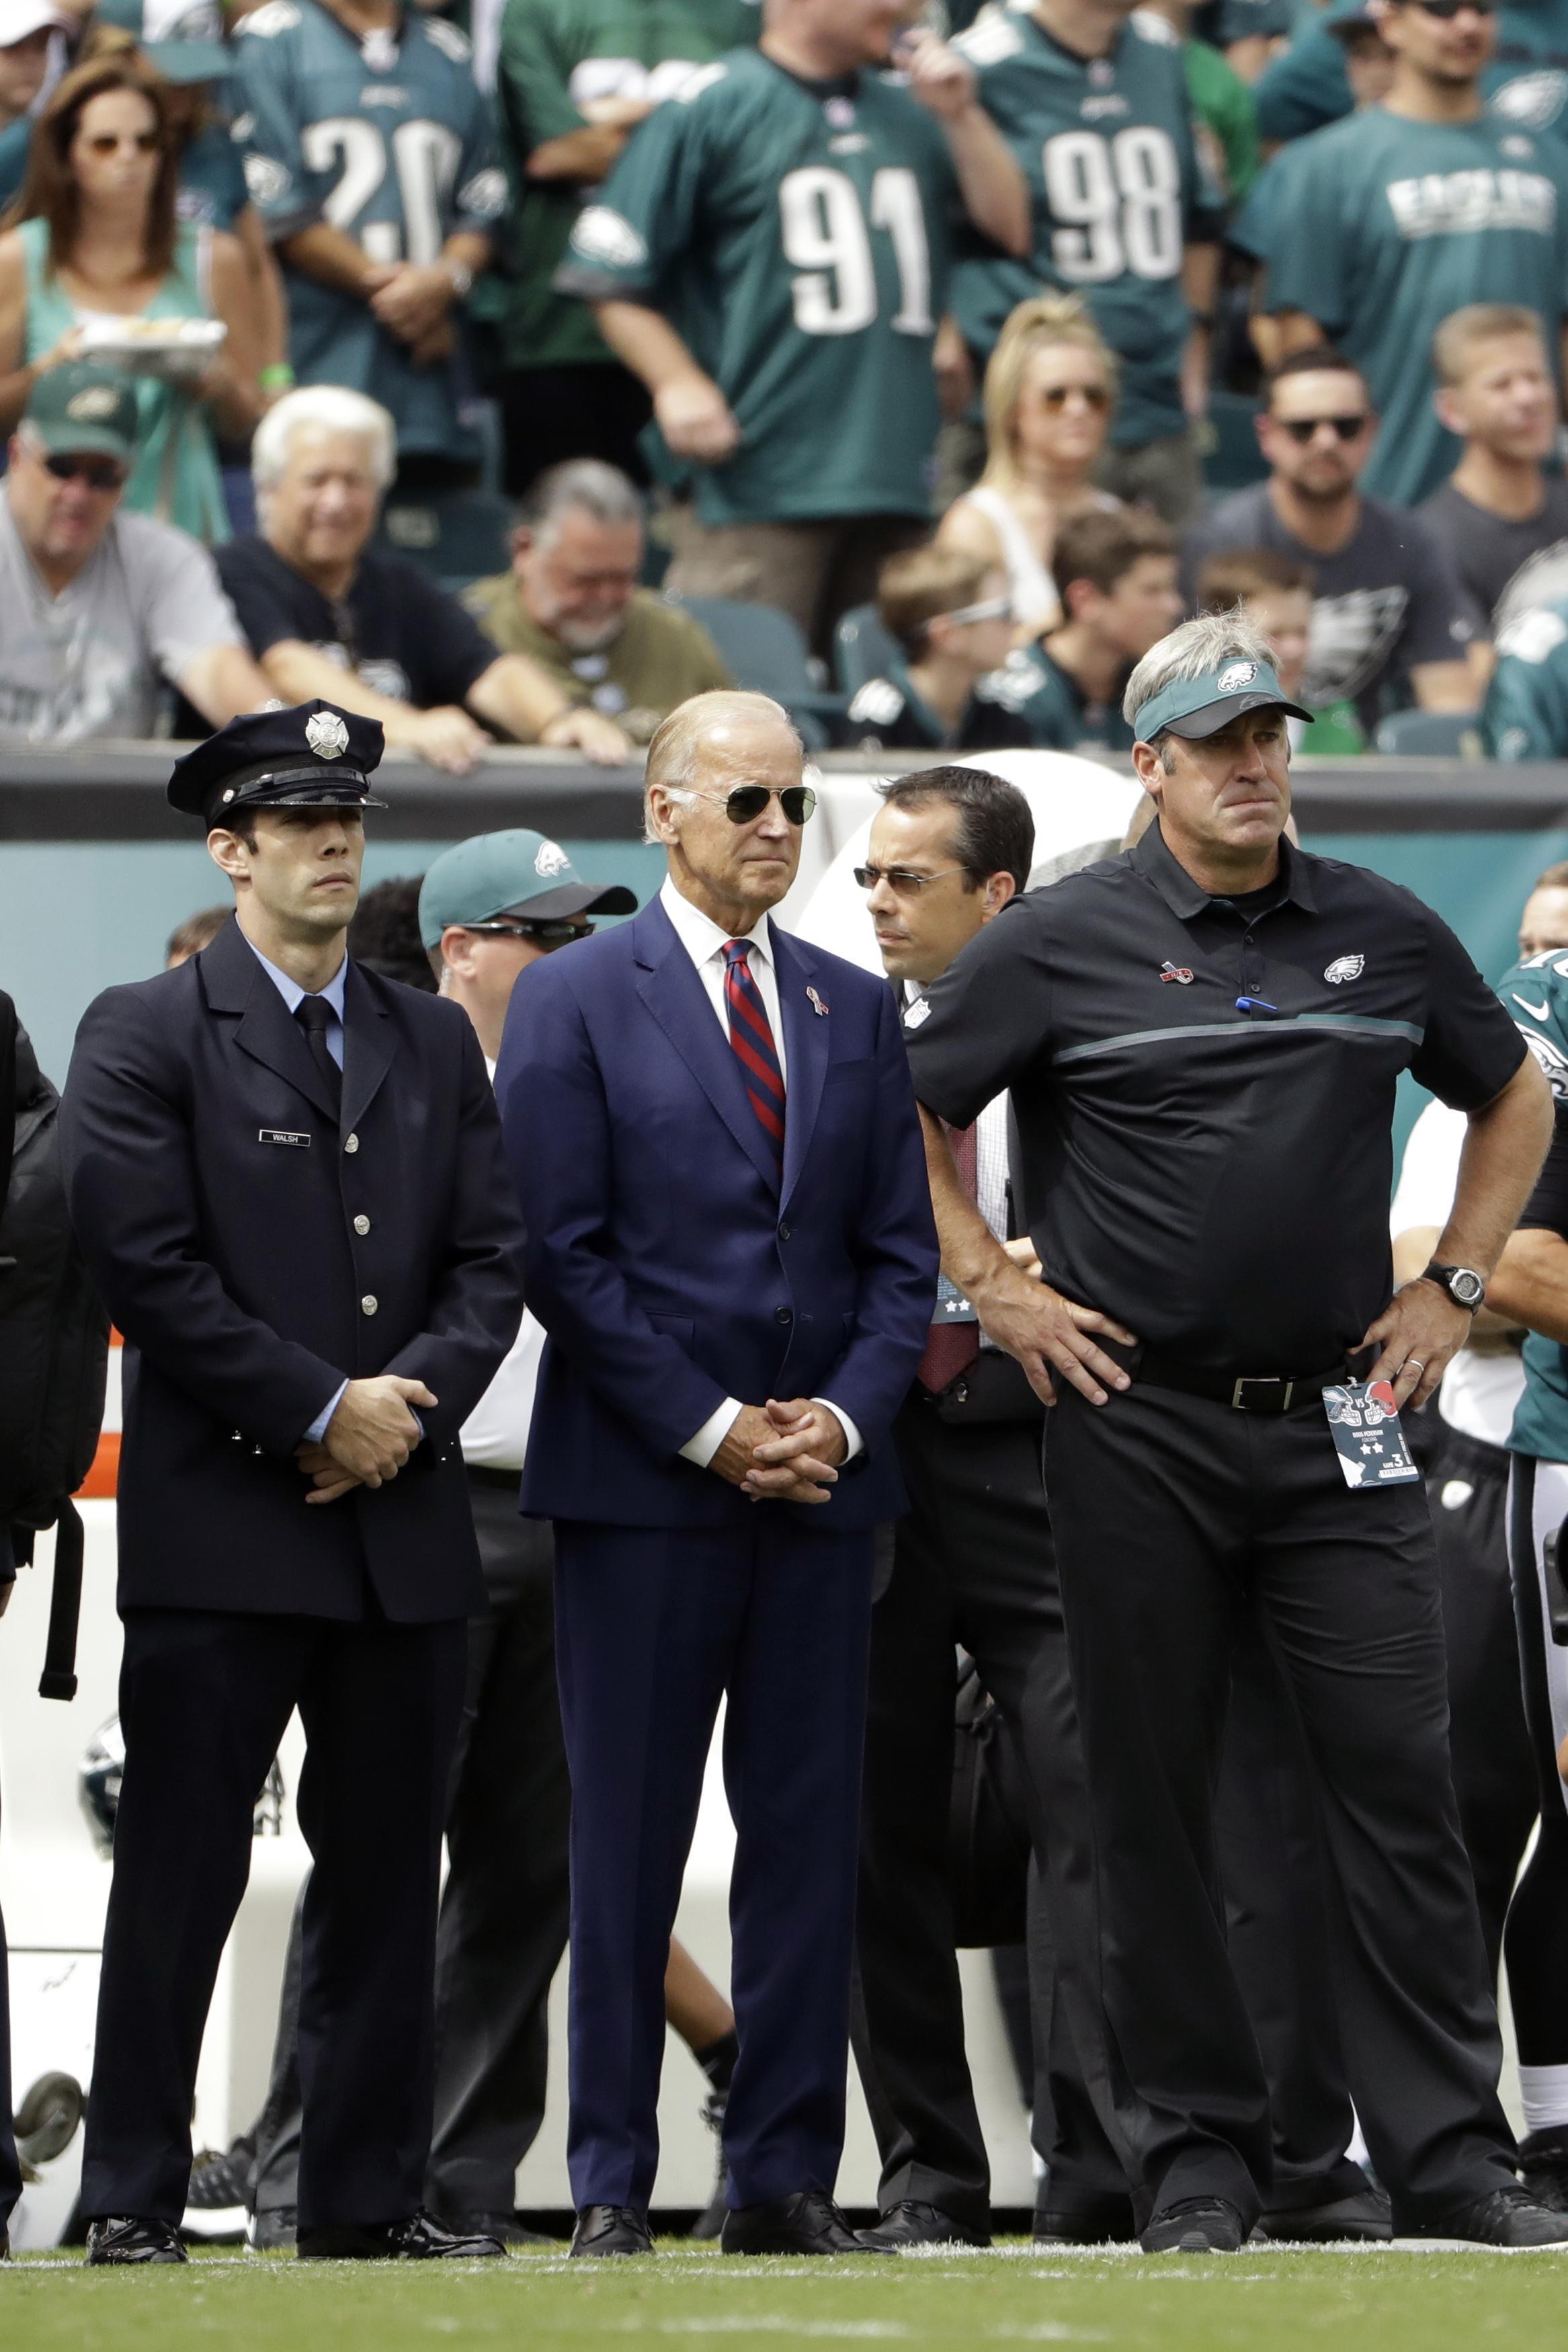 Vice President Joe Biden, center,  and Philadelphia Eagles head coach Doug Pederson, right,  stand before an NFL football game against the Cleveland Browns, Sunday, Sept. 11, 2016, in Philadelphia. (AP Photo/Matt Rourke)